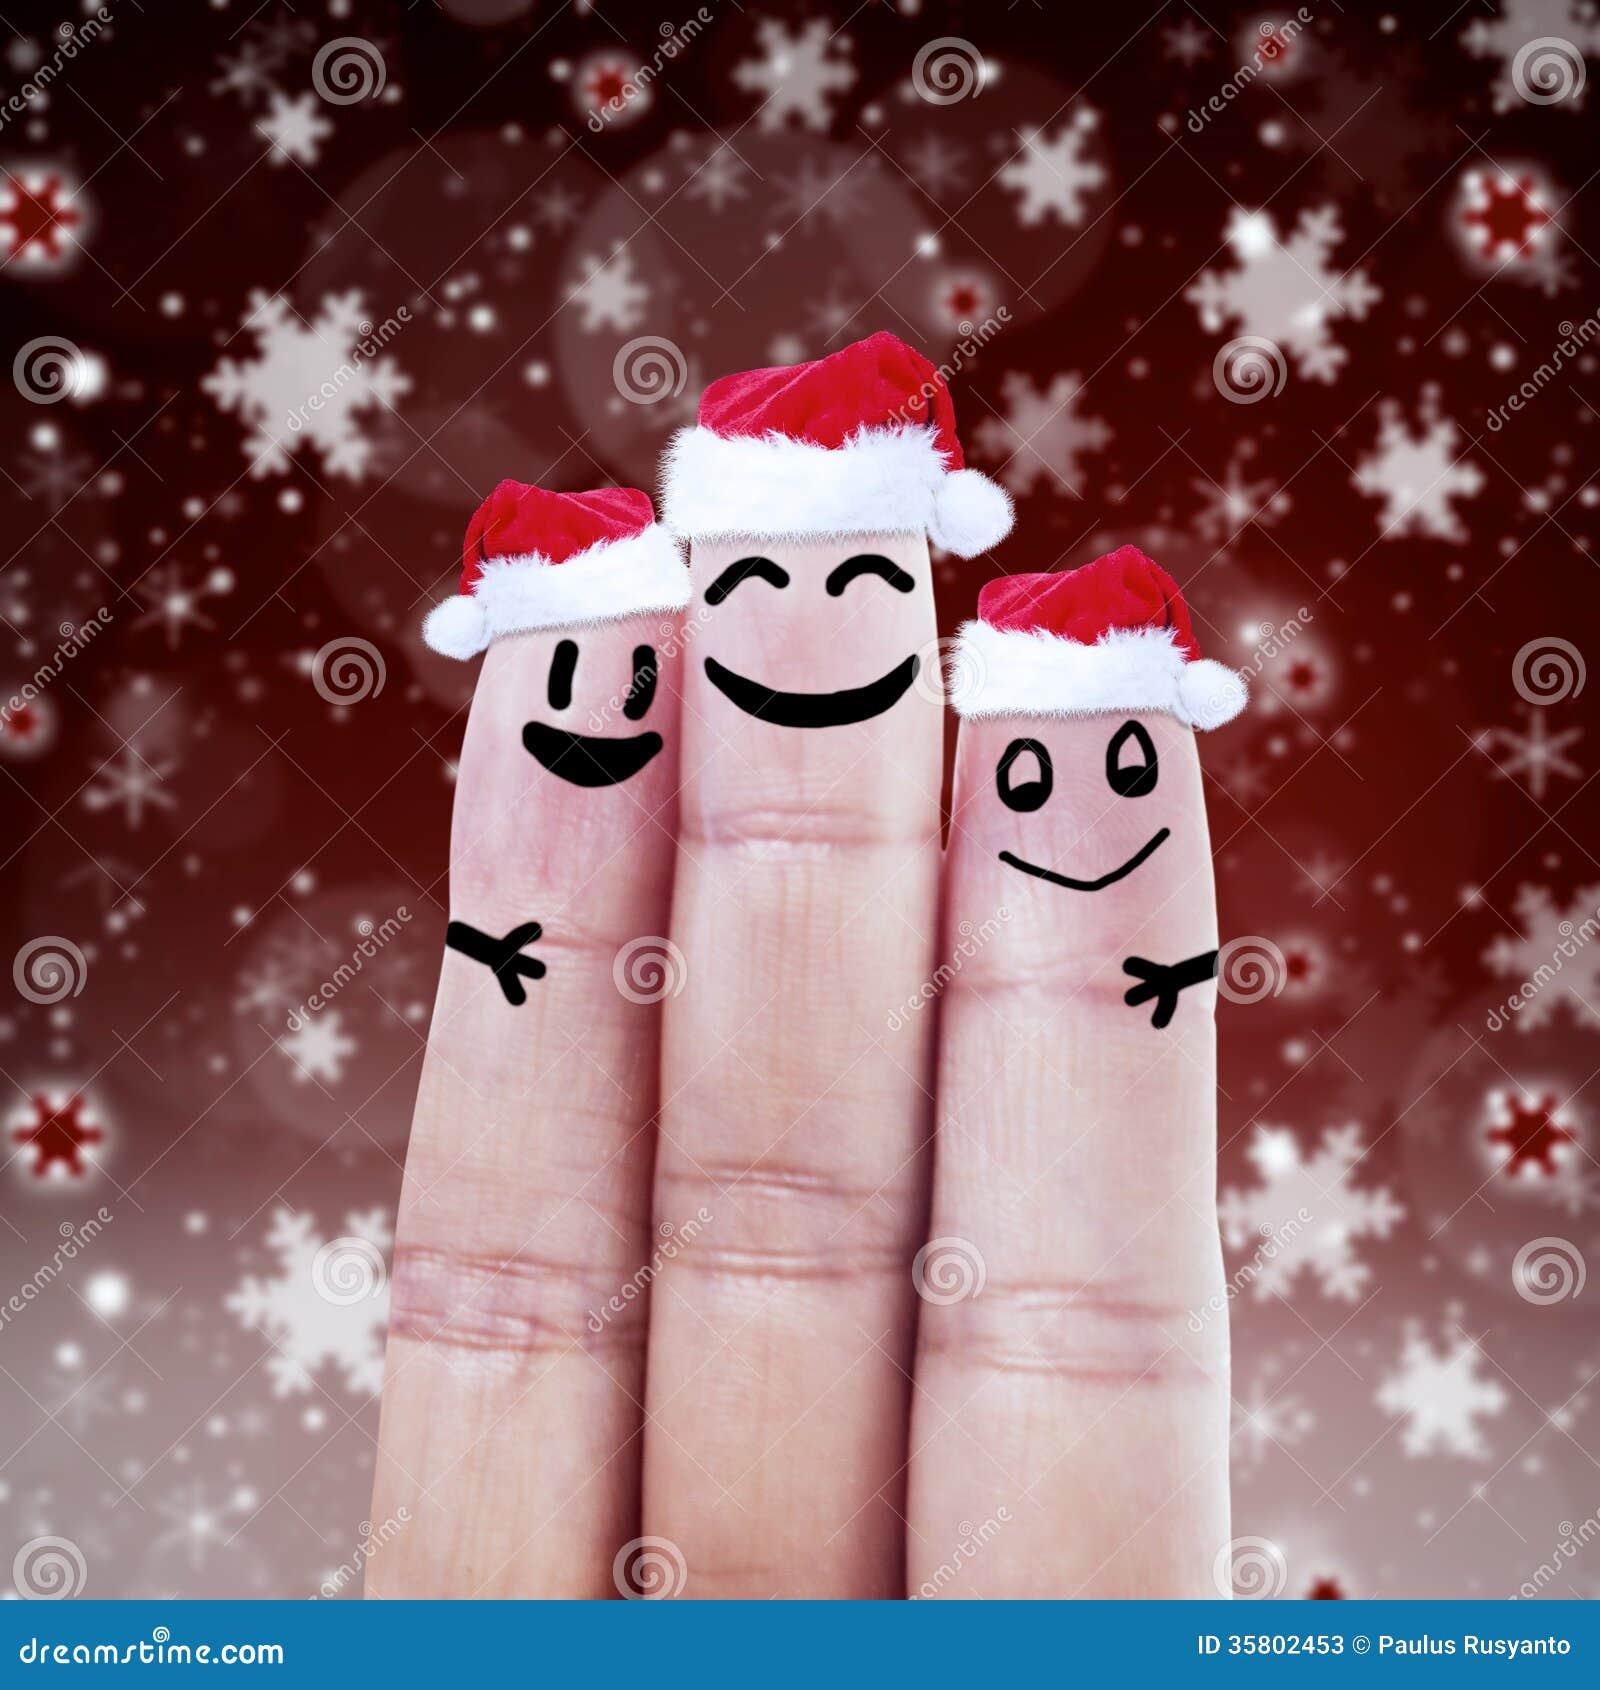 Happy Finger Smileys In Santa Hats Stock Image - Image of friends ...